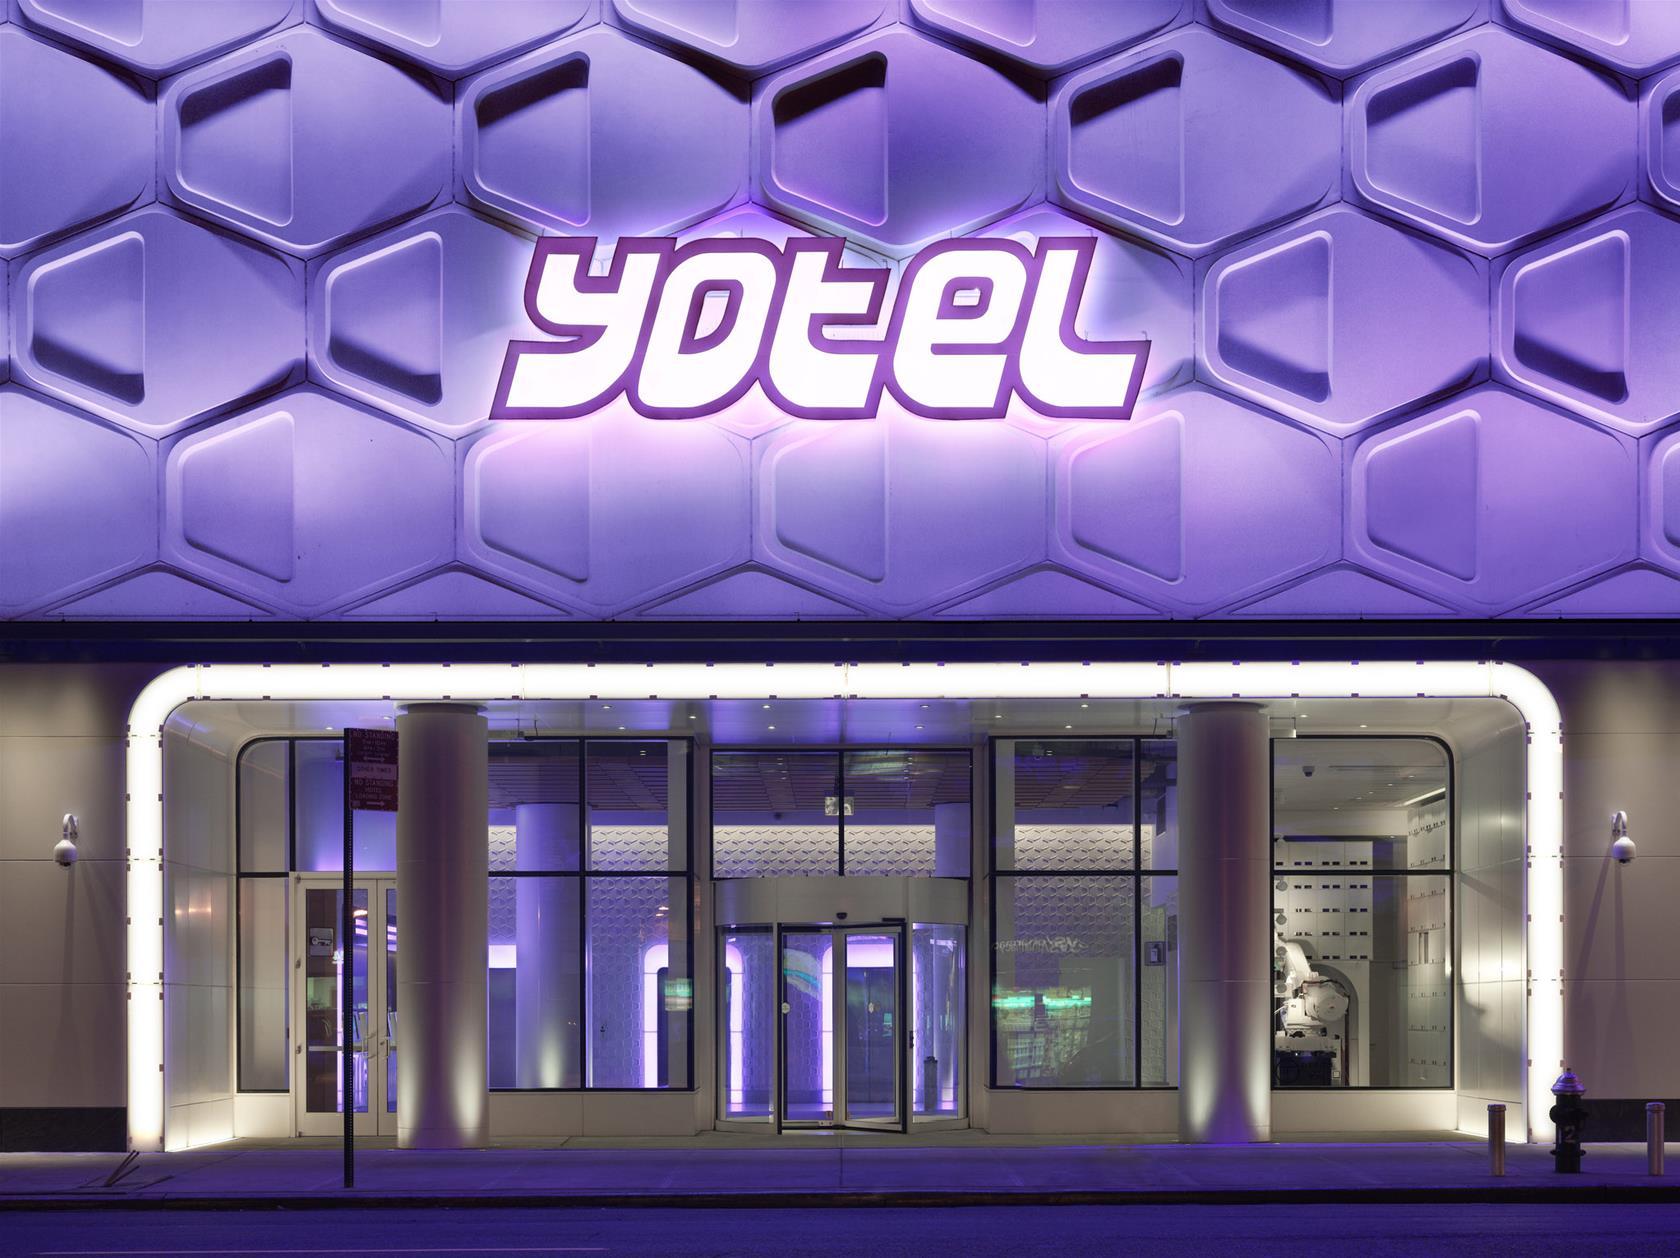 Yotel New York 3. Nueva York